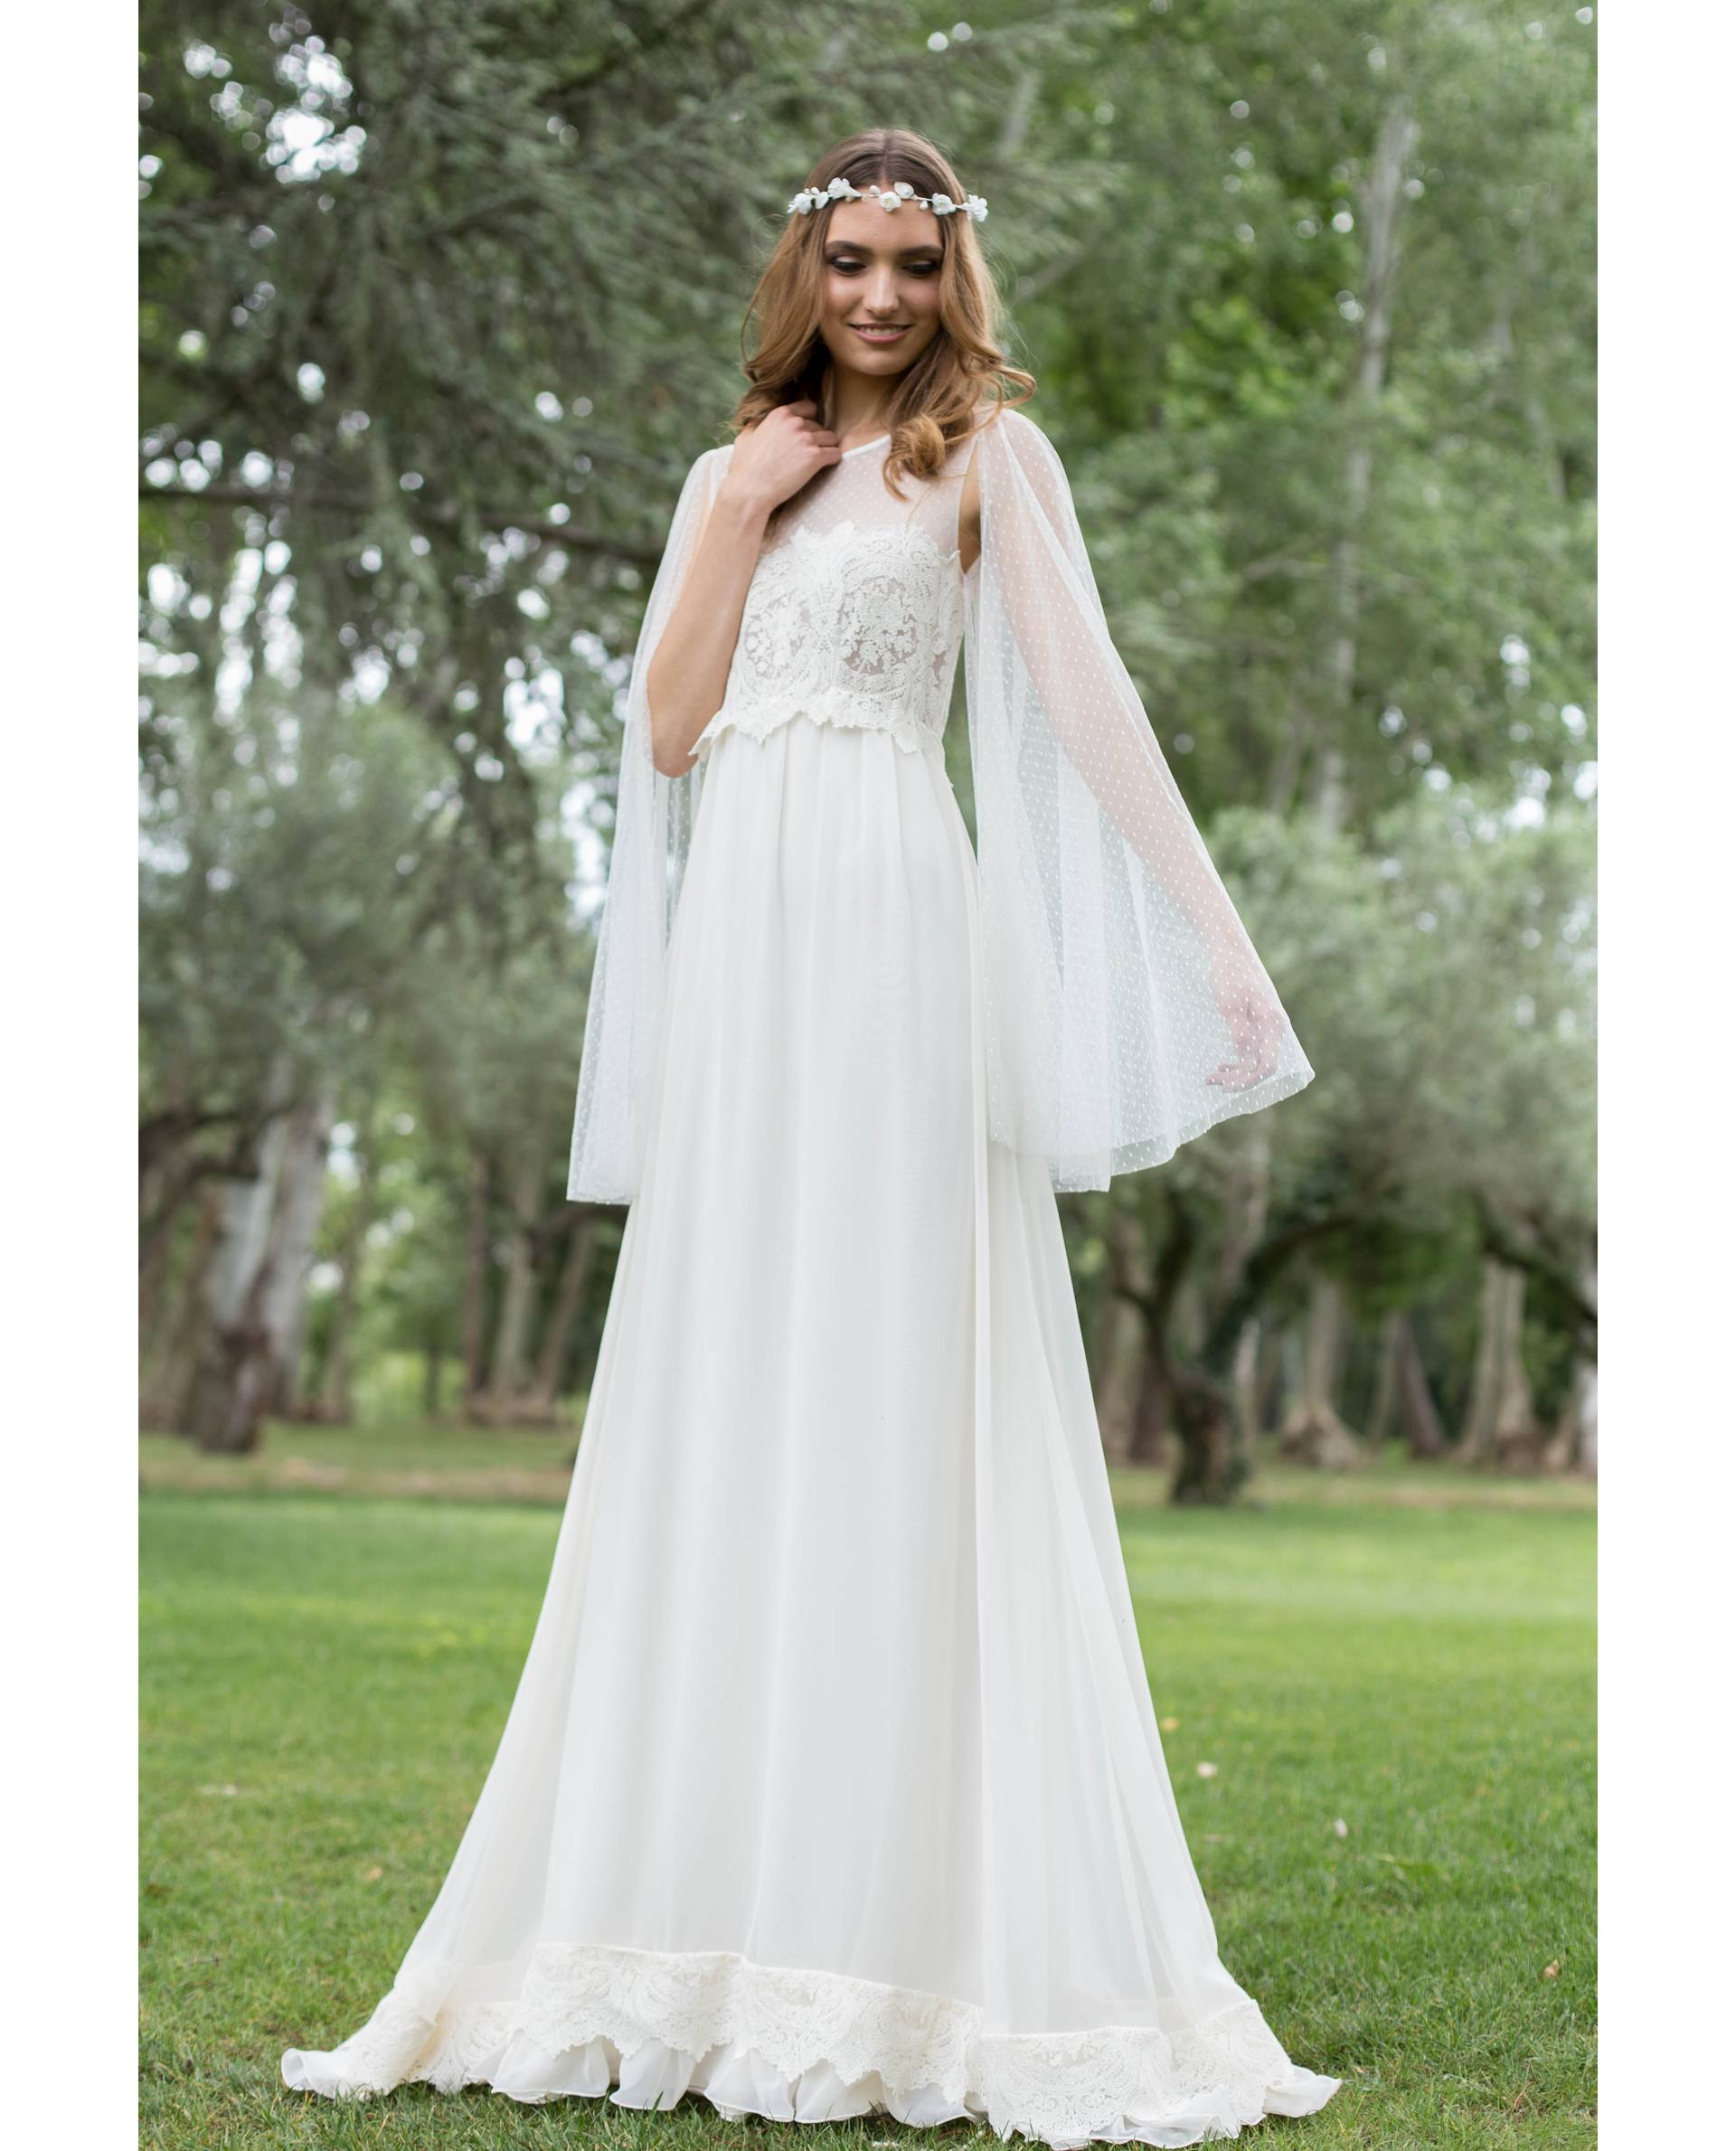 BRIDAL-NATURE 2017/18 - VESTIDOS - vestido novia Eril